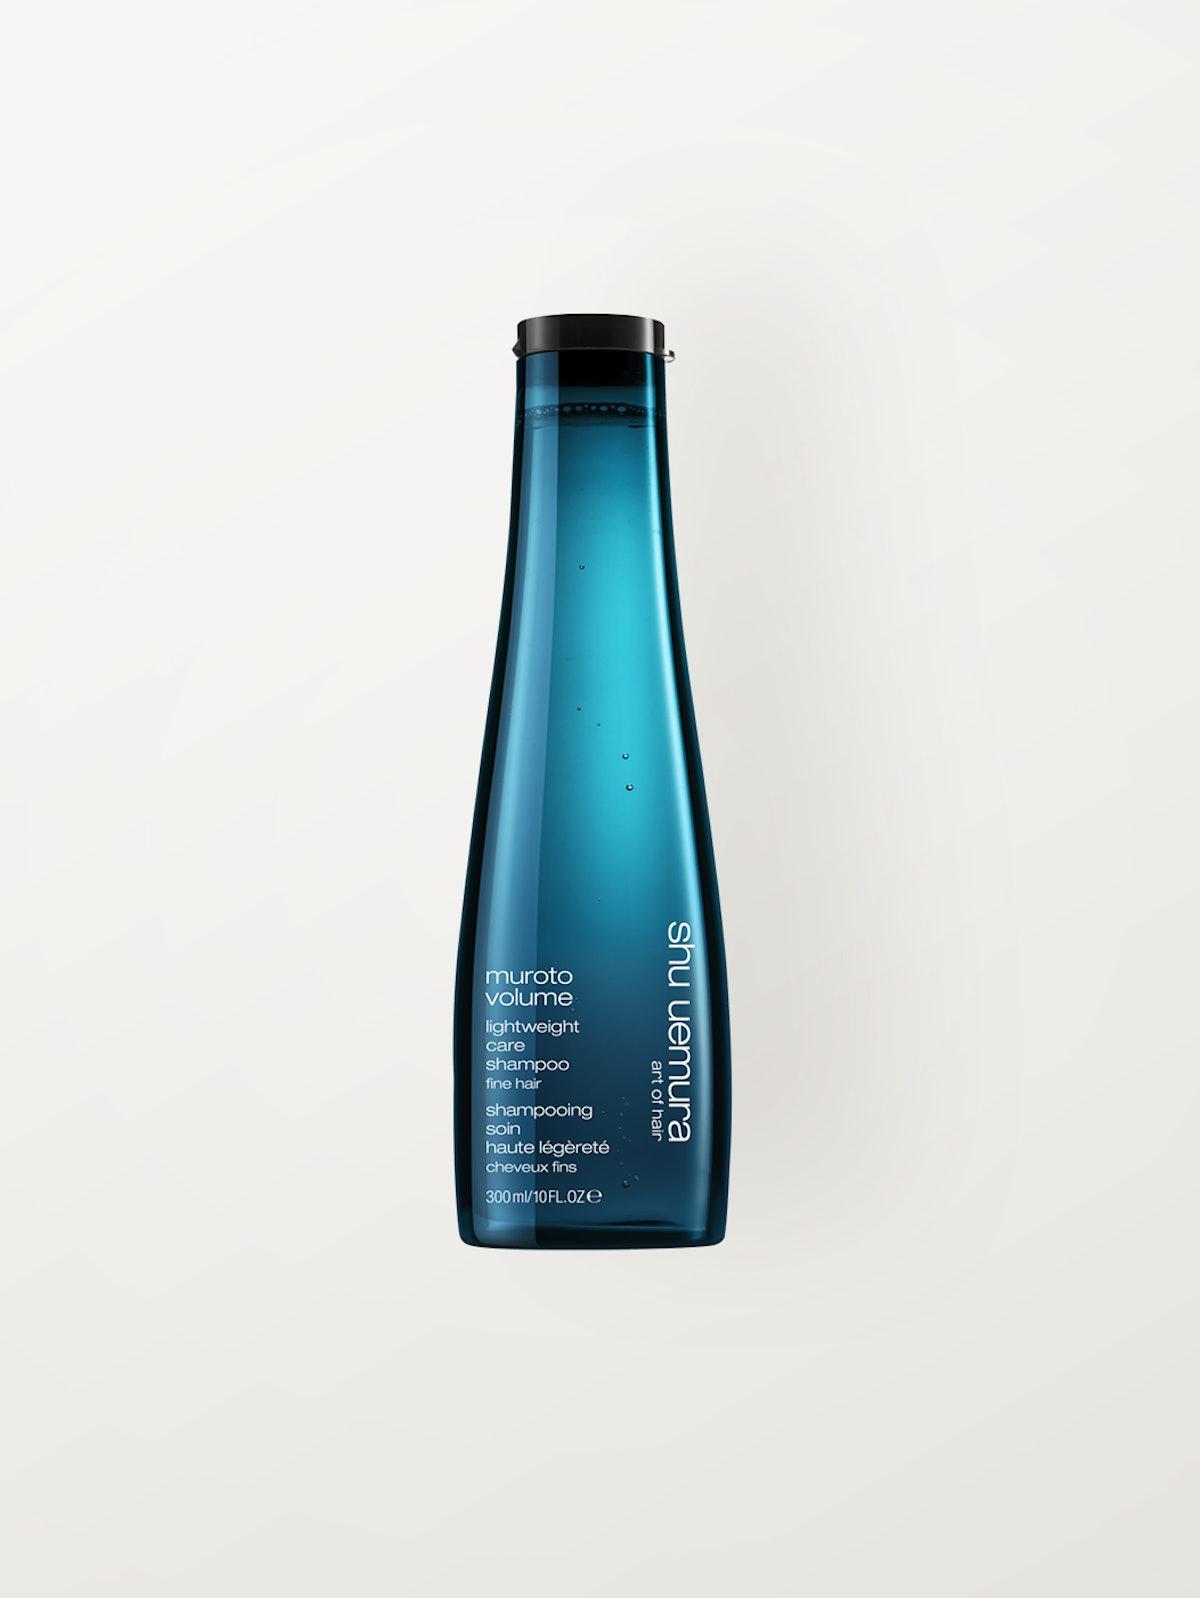 Muroto Volume Lightweight Care Shampoo For Fine Hair